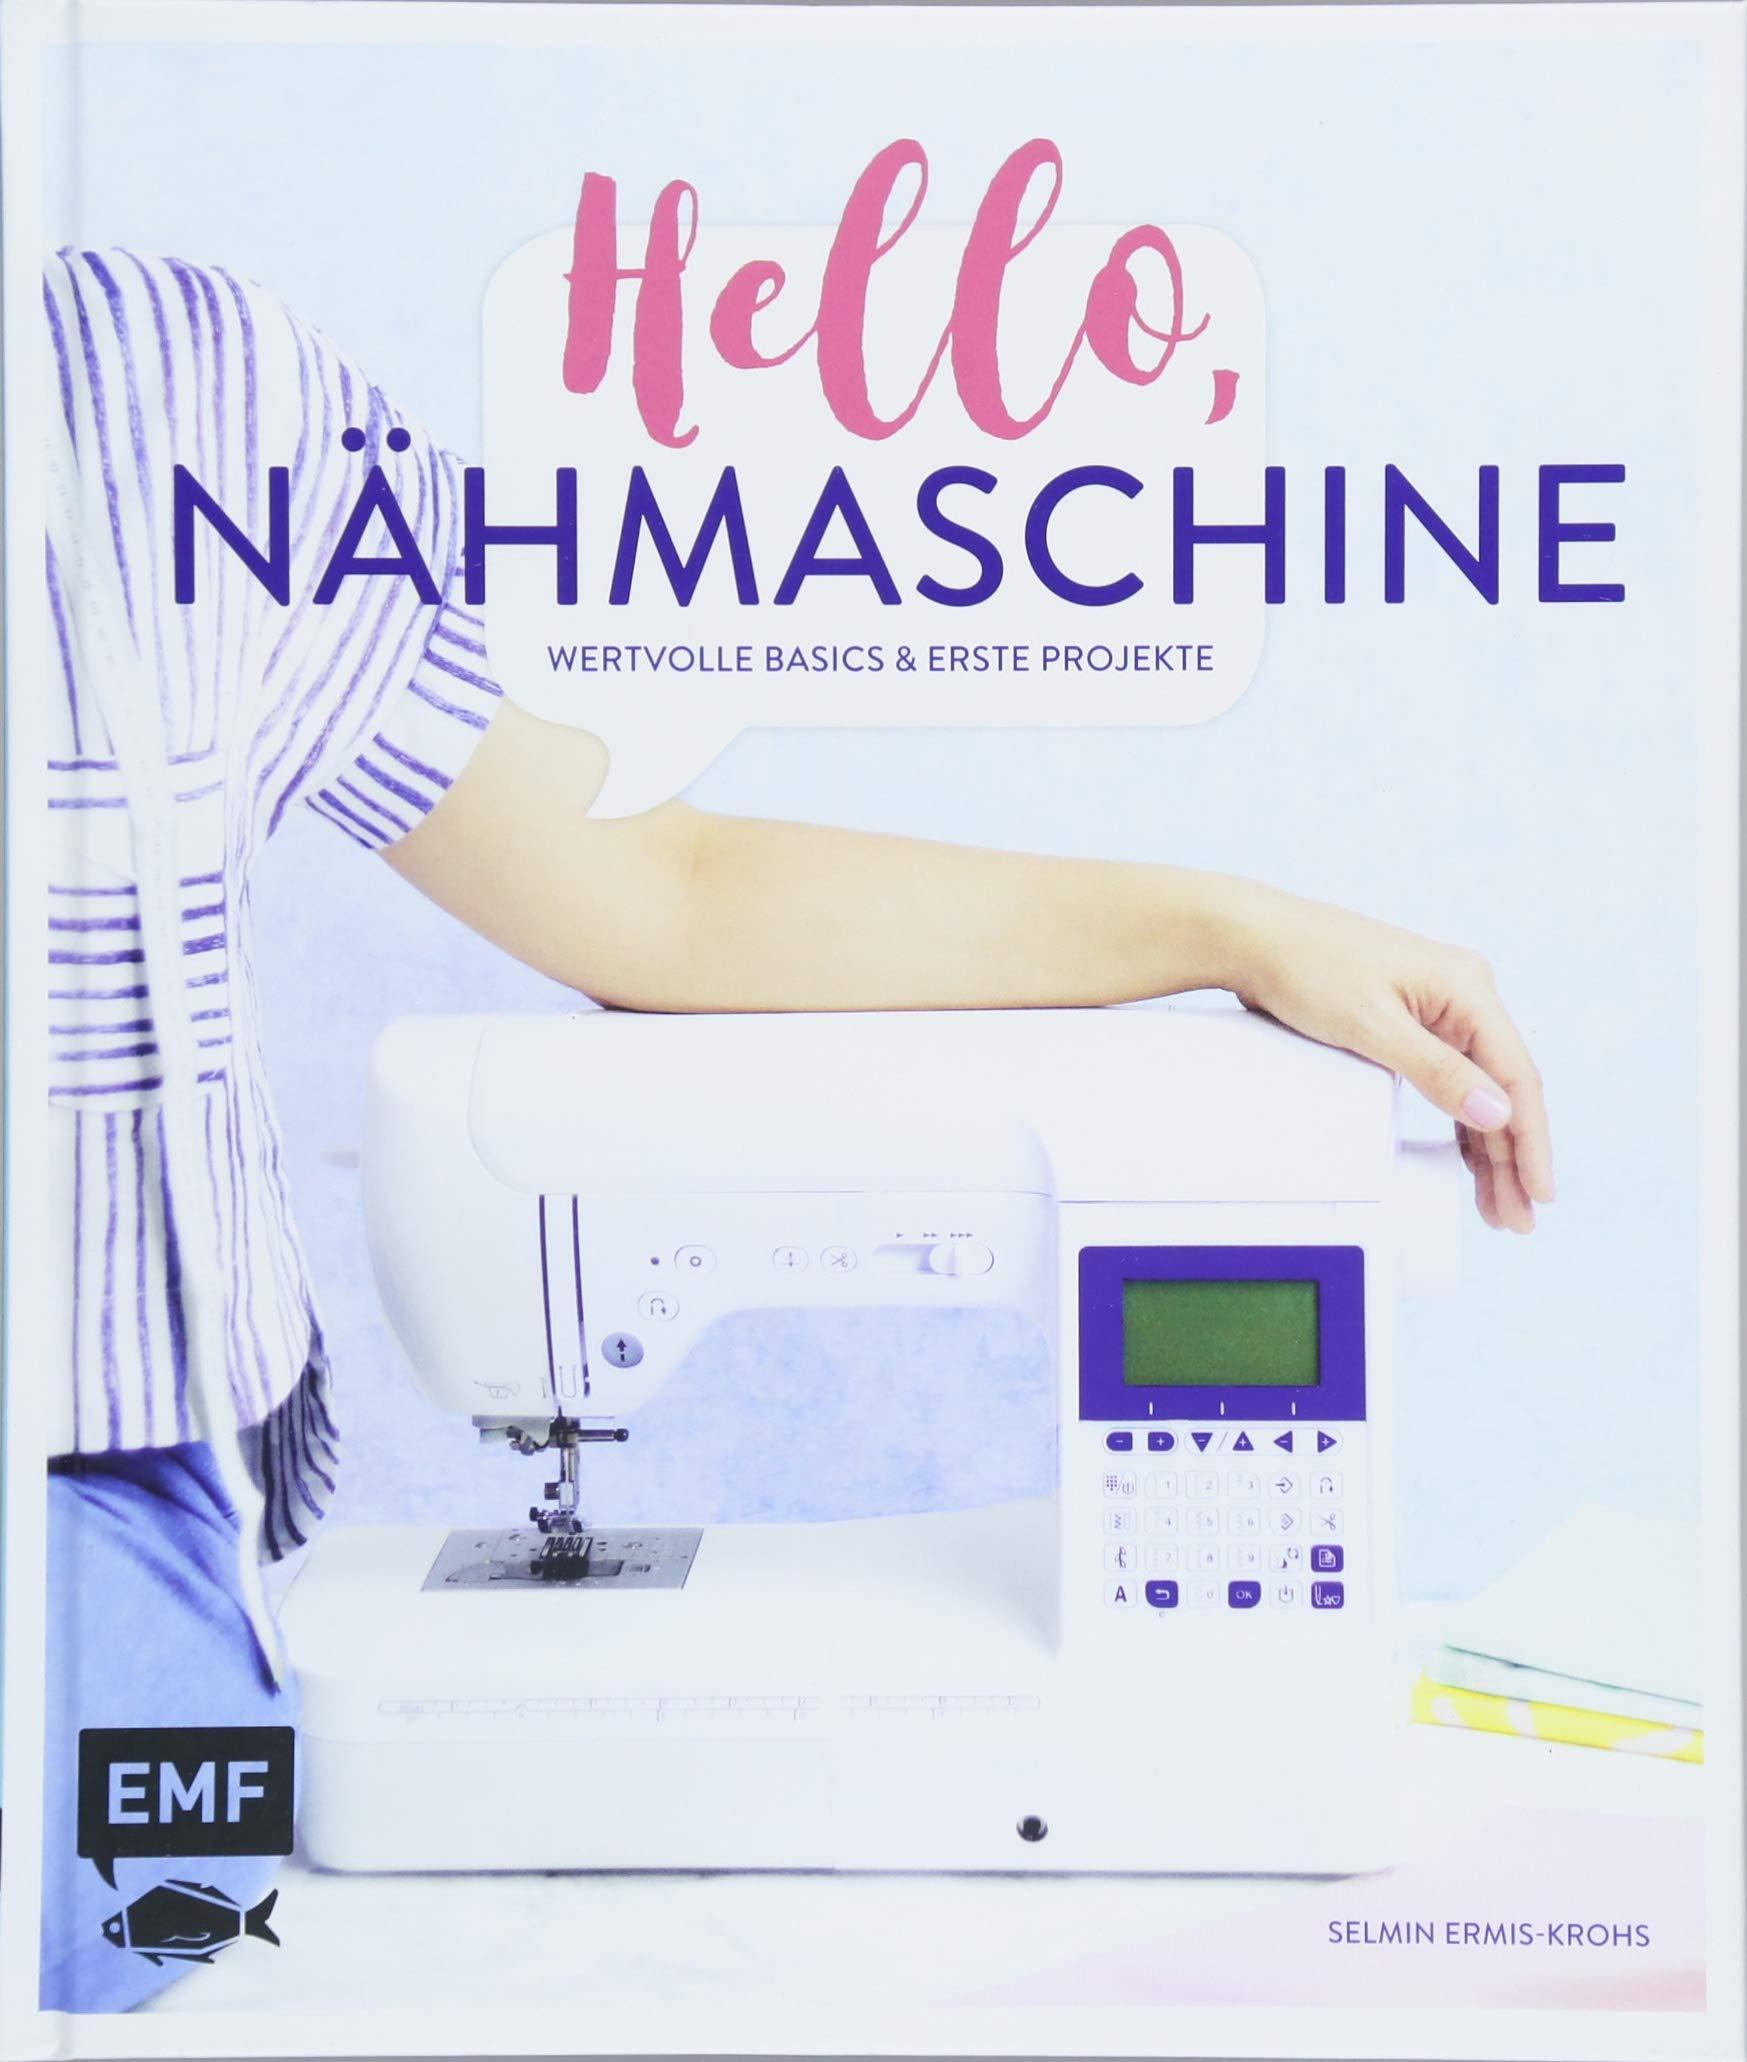 Hello, Nähmaschine – Wertvolle Basics und erste Projekte nähen